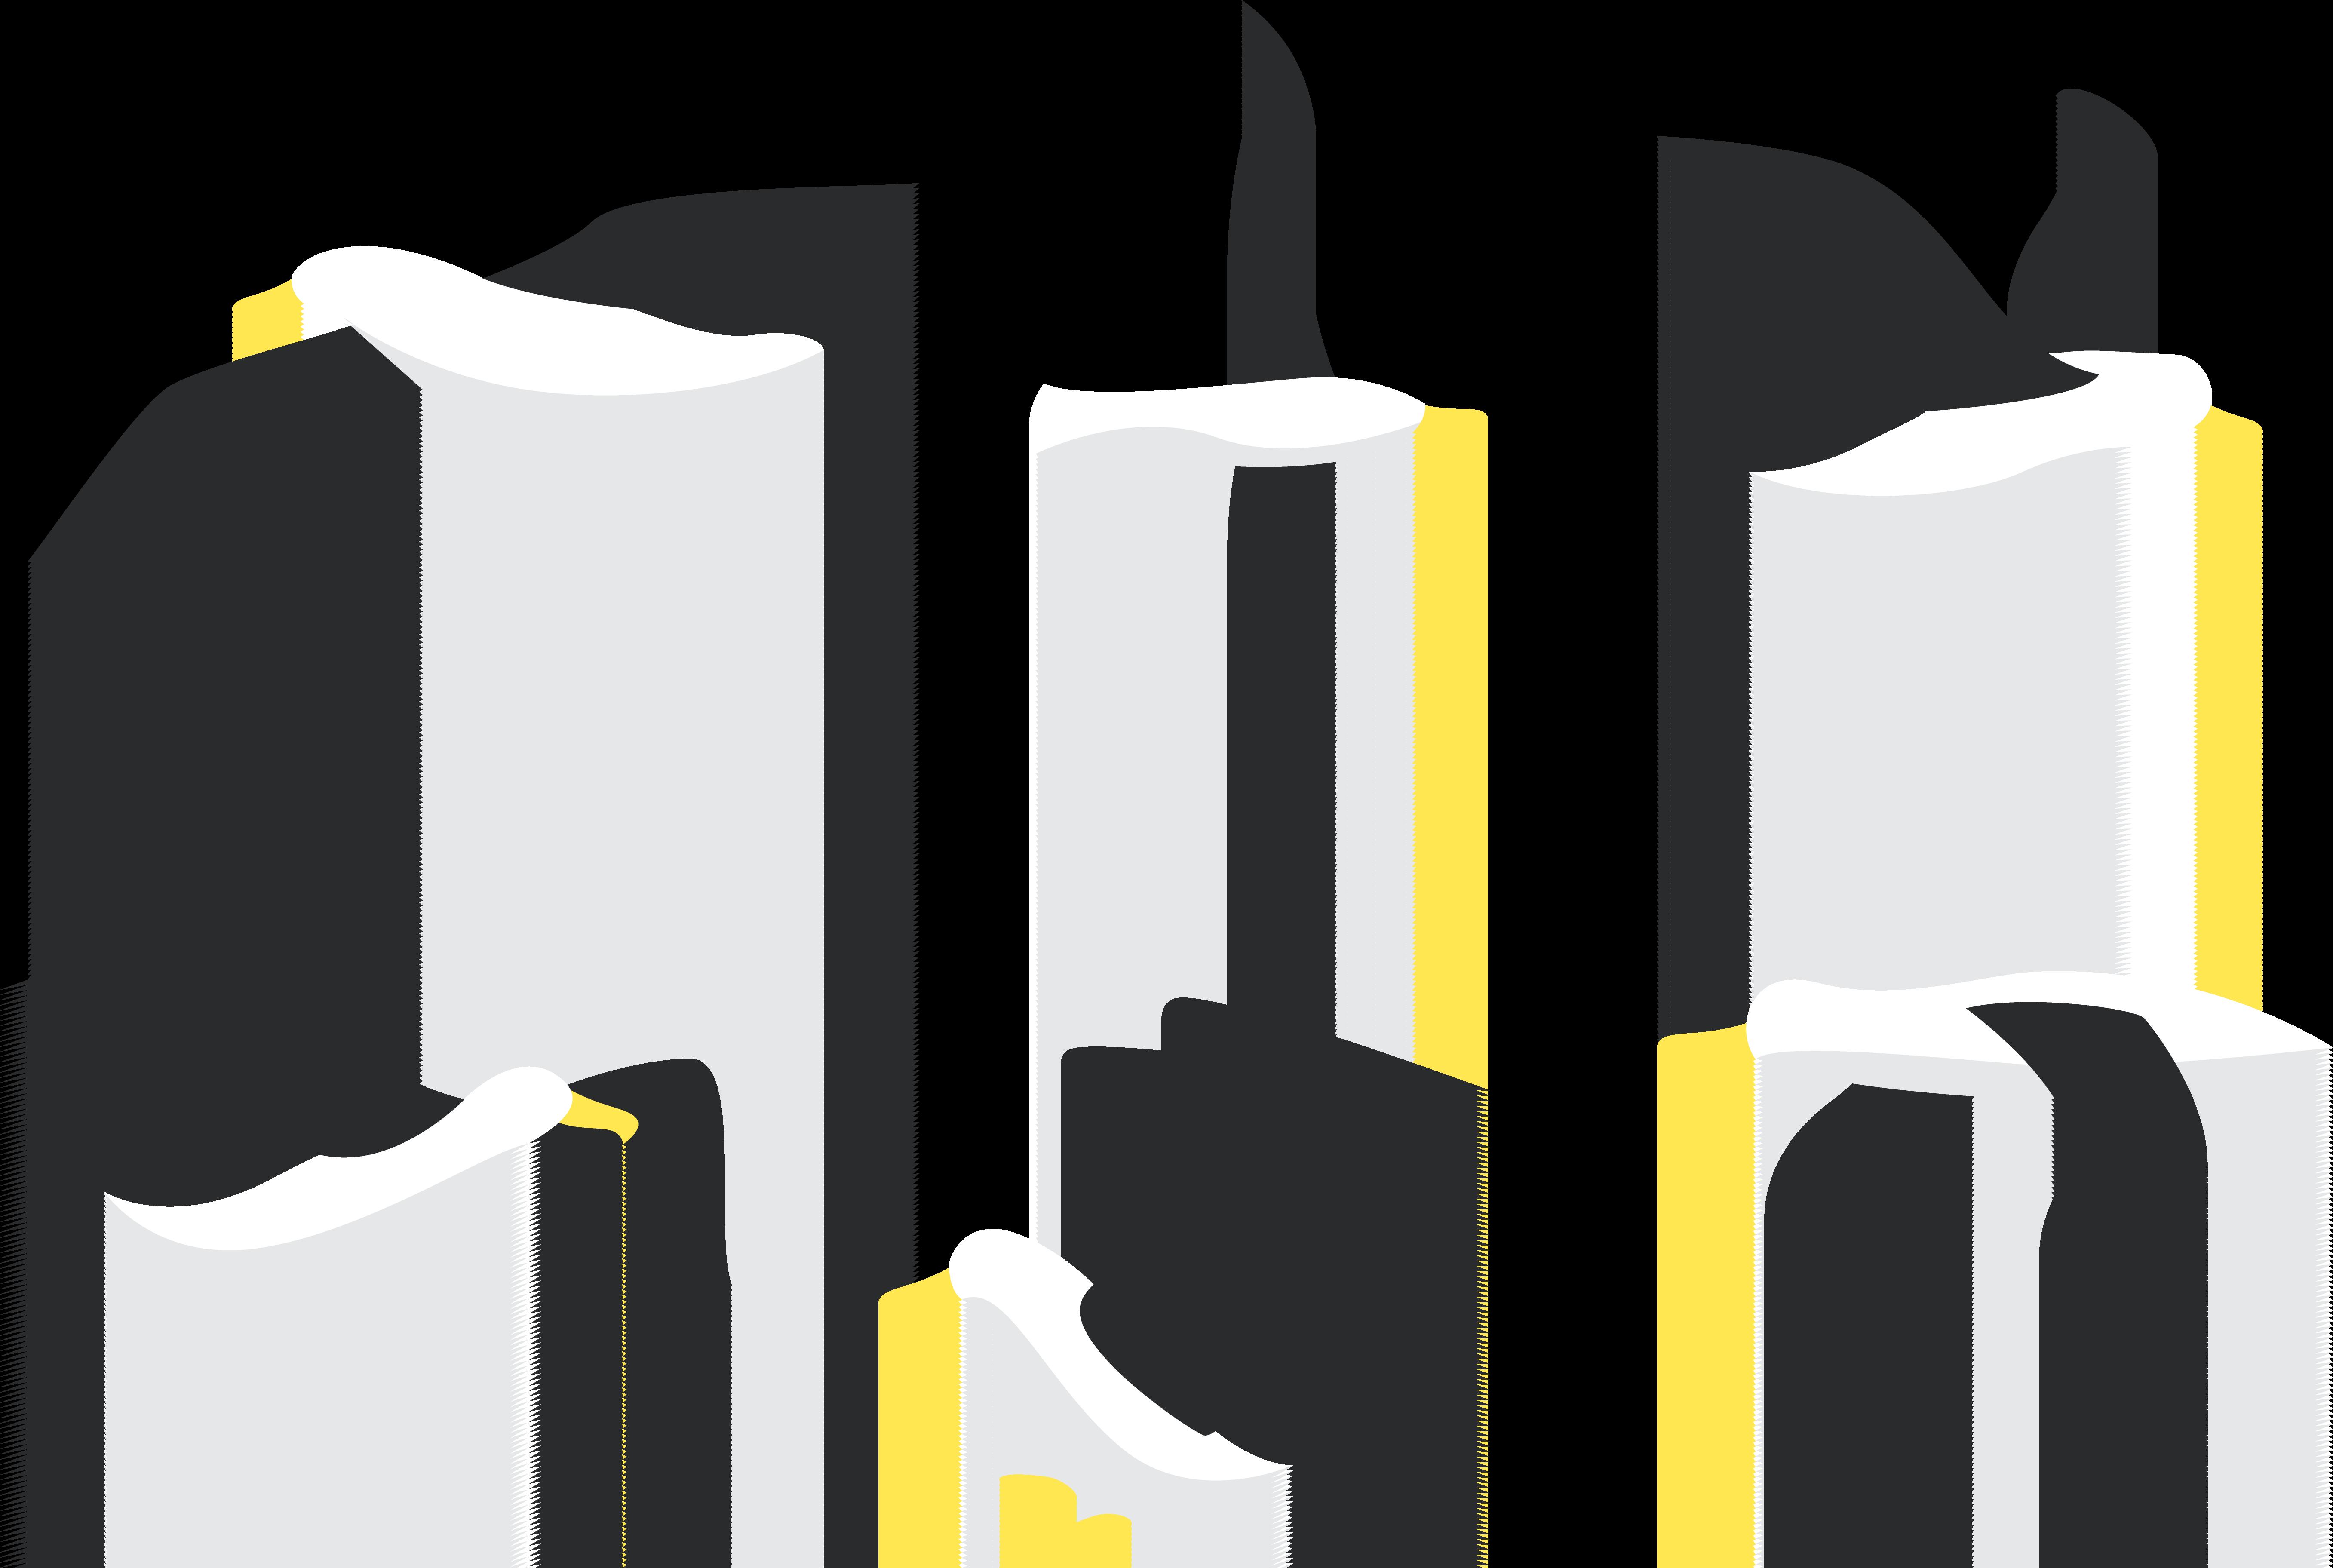 5426x3647 Albatross Drawing Flying Huge Freebie! Download For Powerpoint